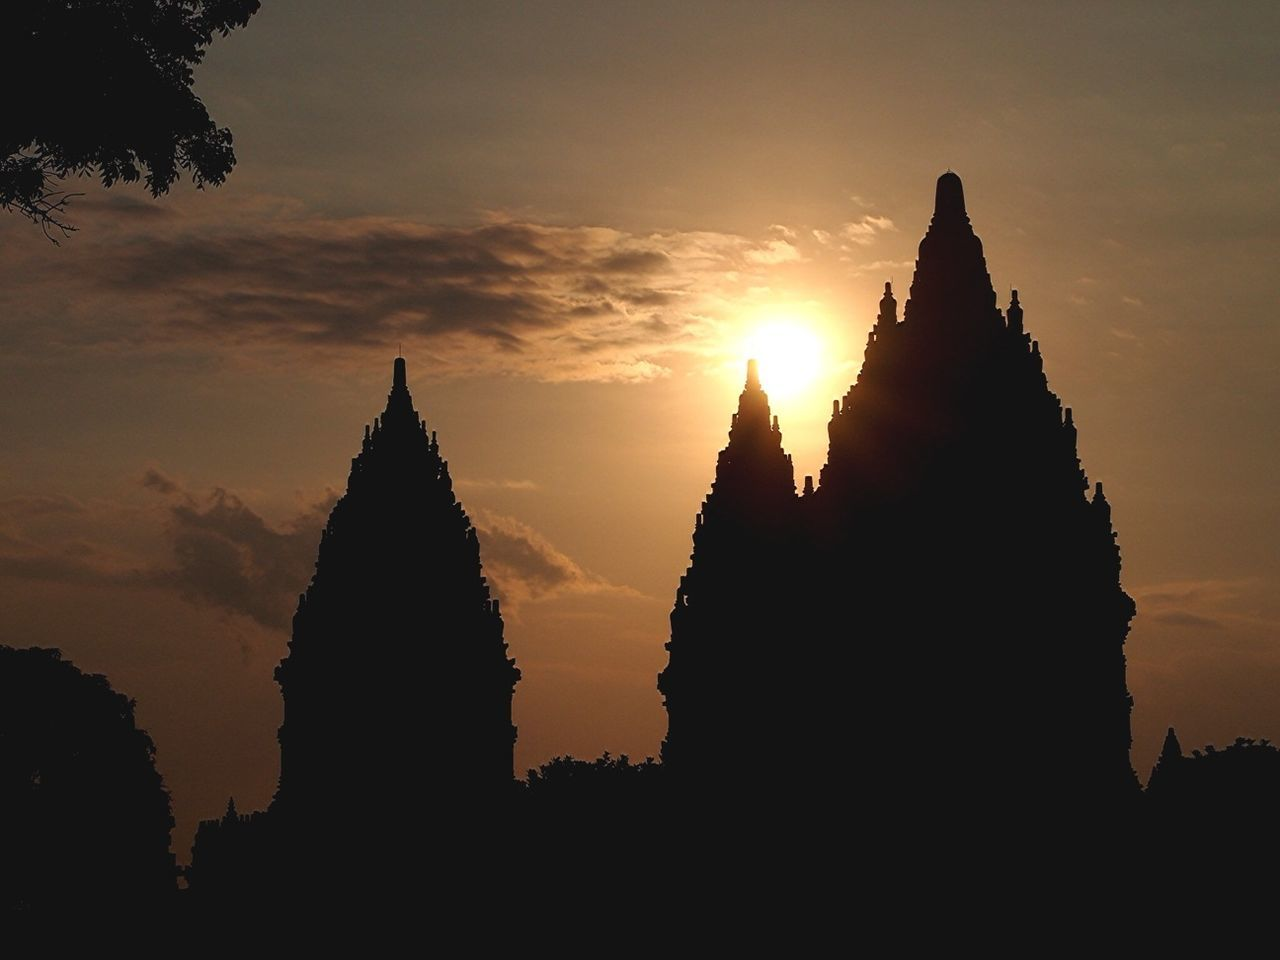 I Love Indonesia Sunset Silhouettes